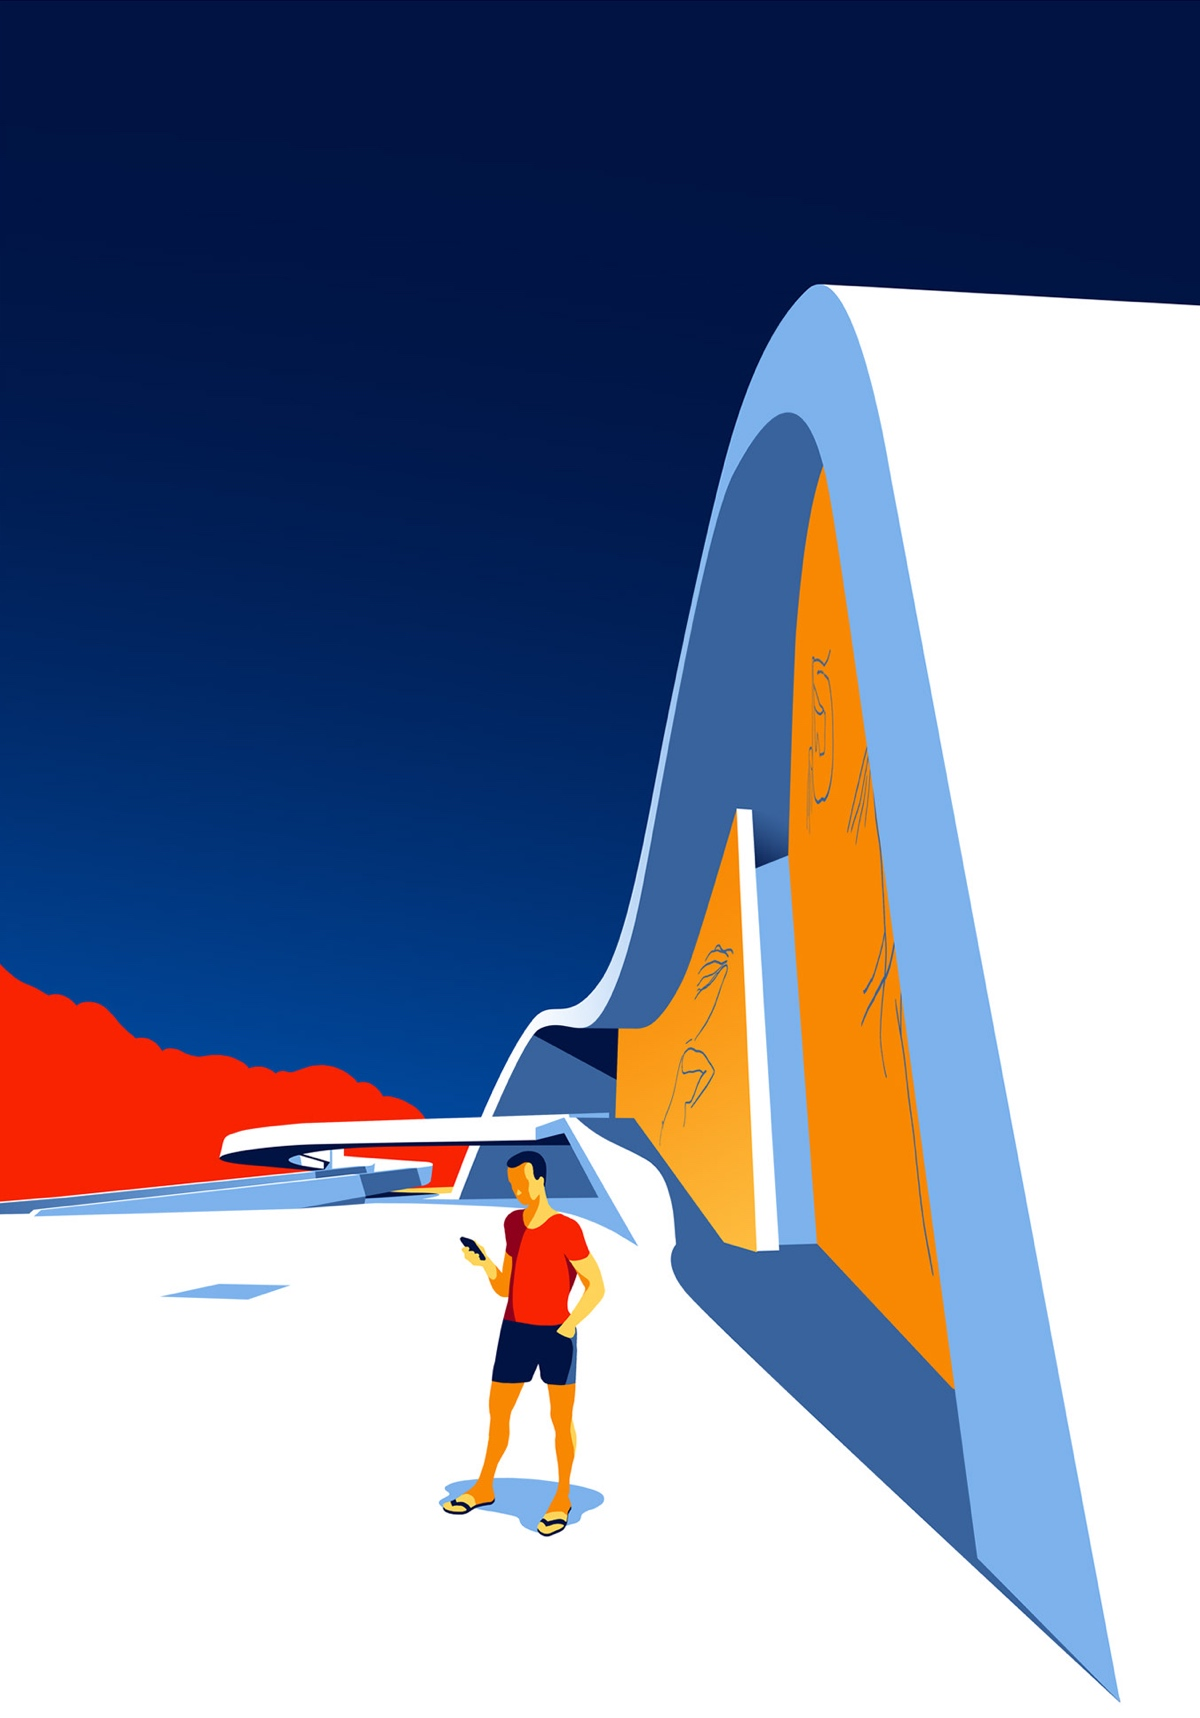 oscar-niemeyer-architecture-illustrations-levente-szabo-10